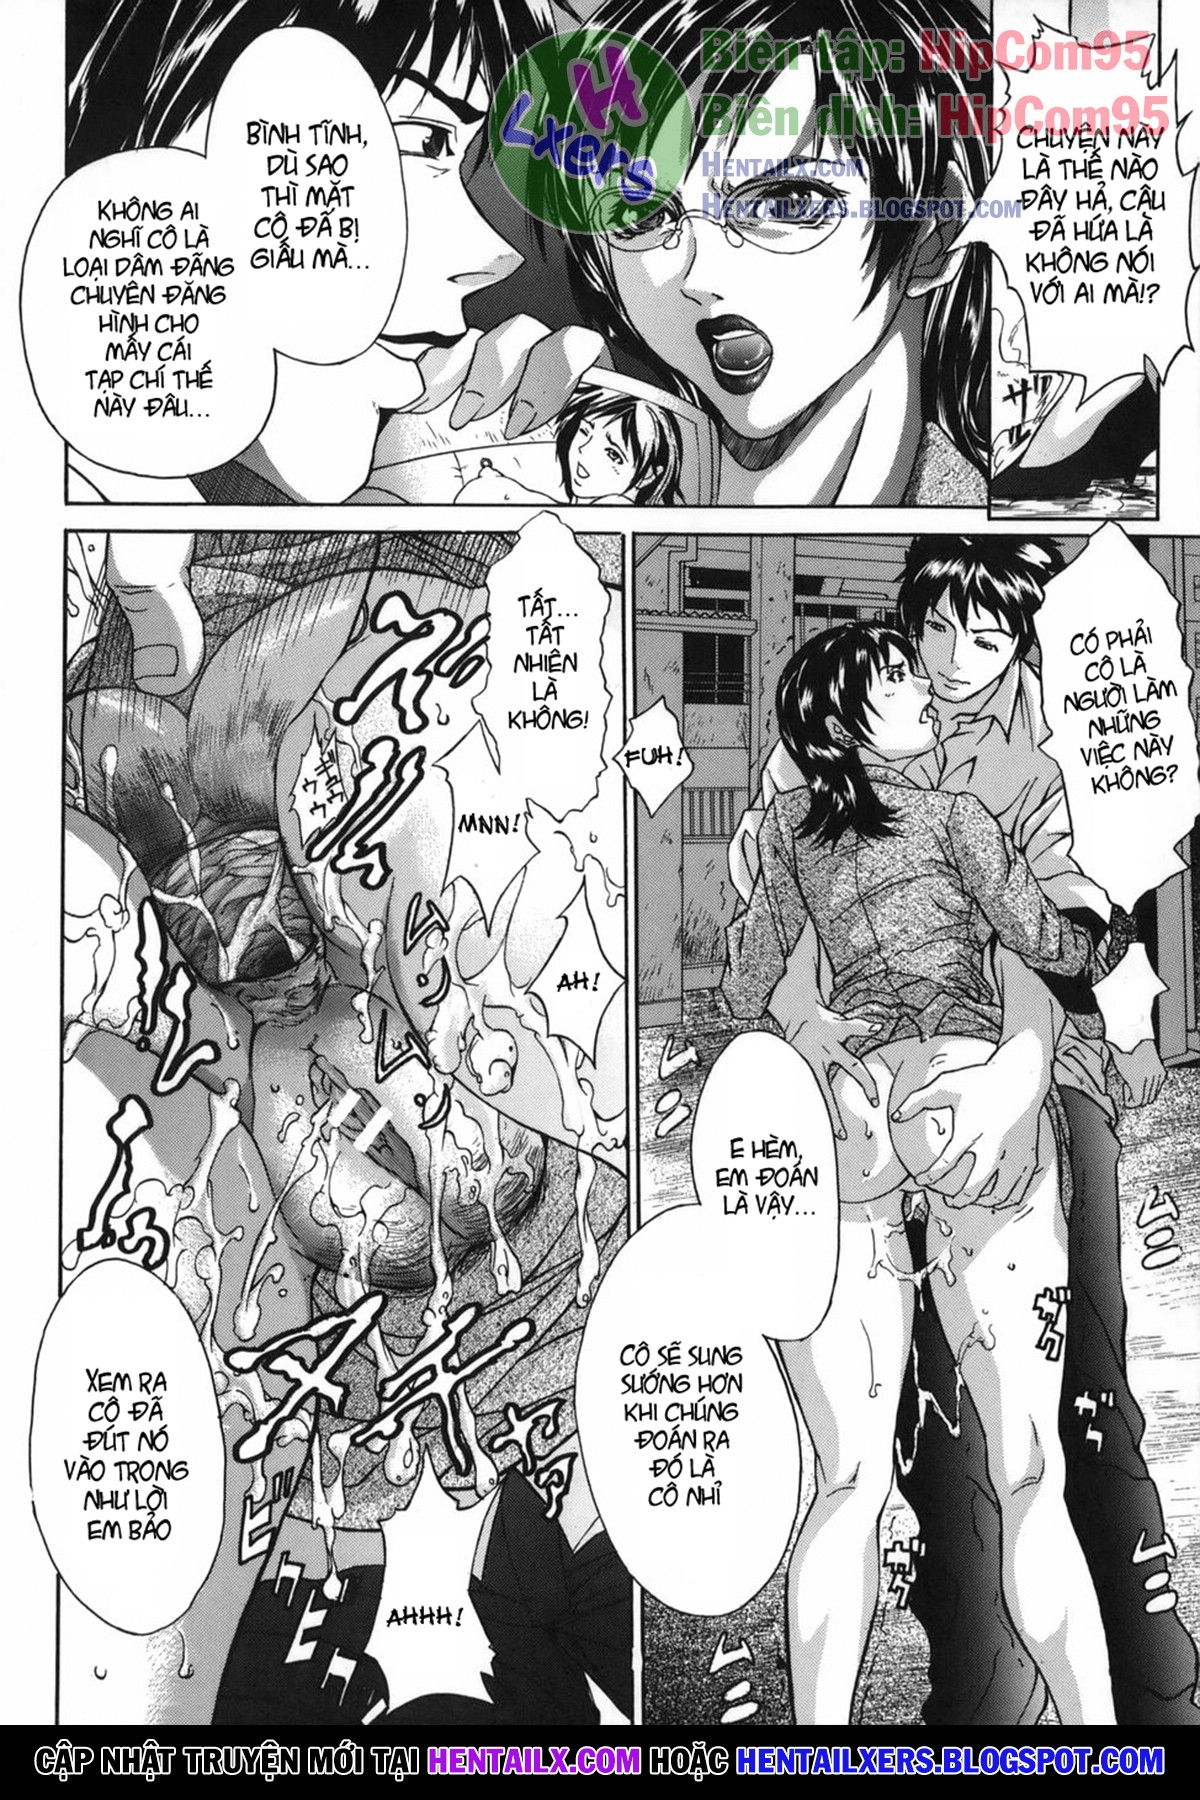 Hình ảnh 010_boinzuma_010 in Boinzuma - Motherlike Obscene Wife